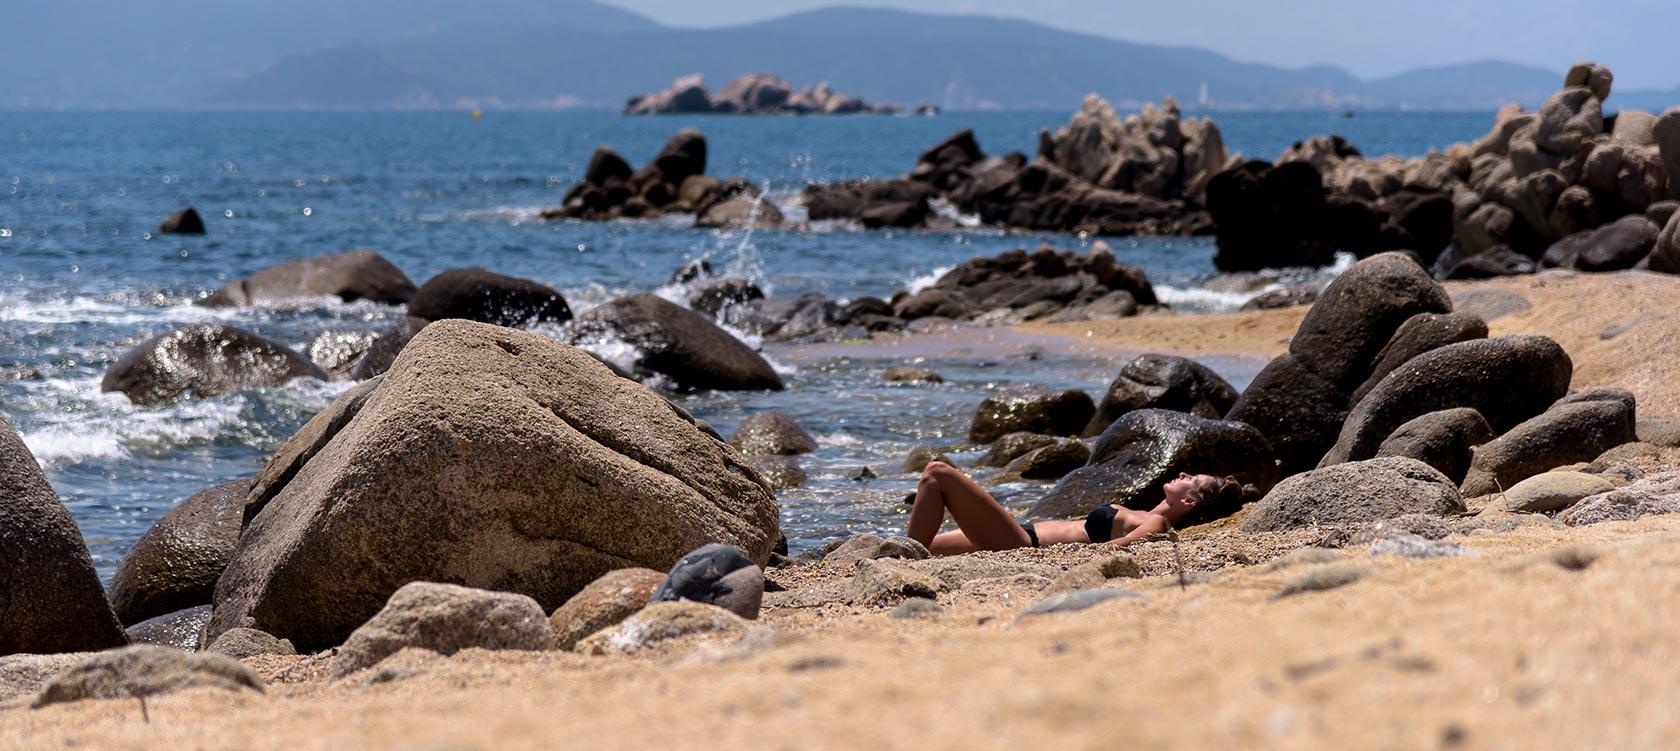 Plage Cupabia Corse du Sud